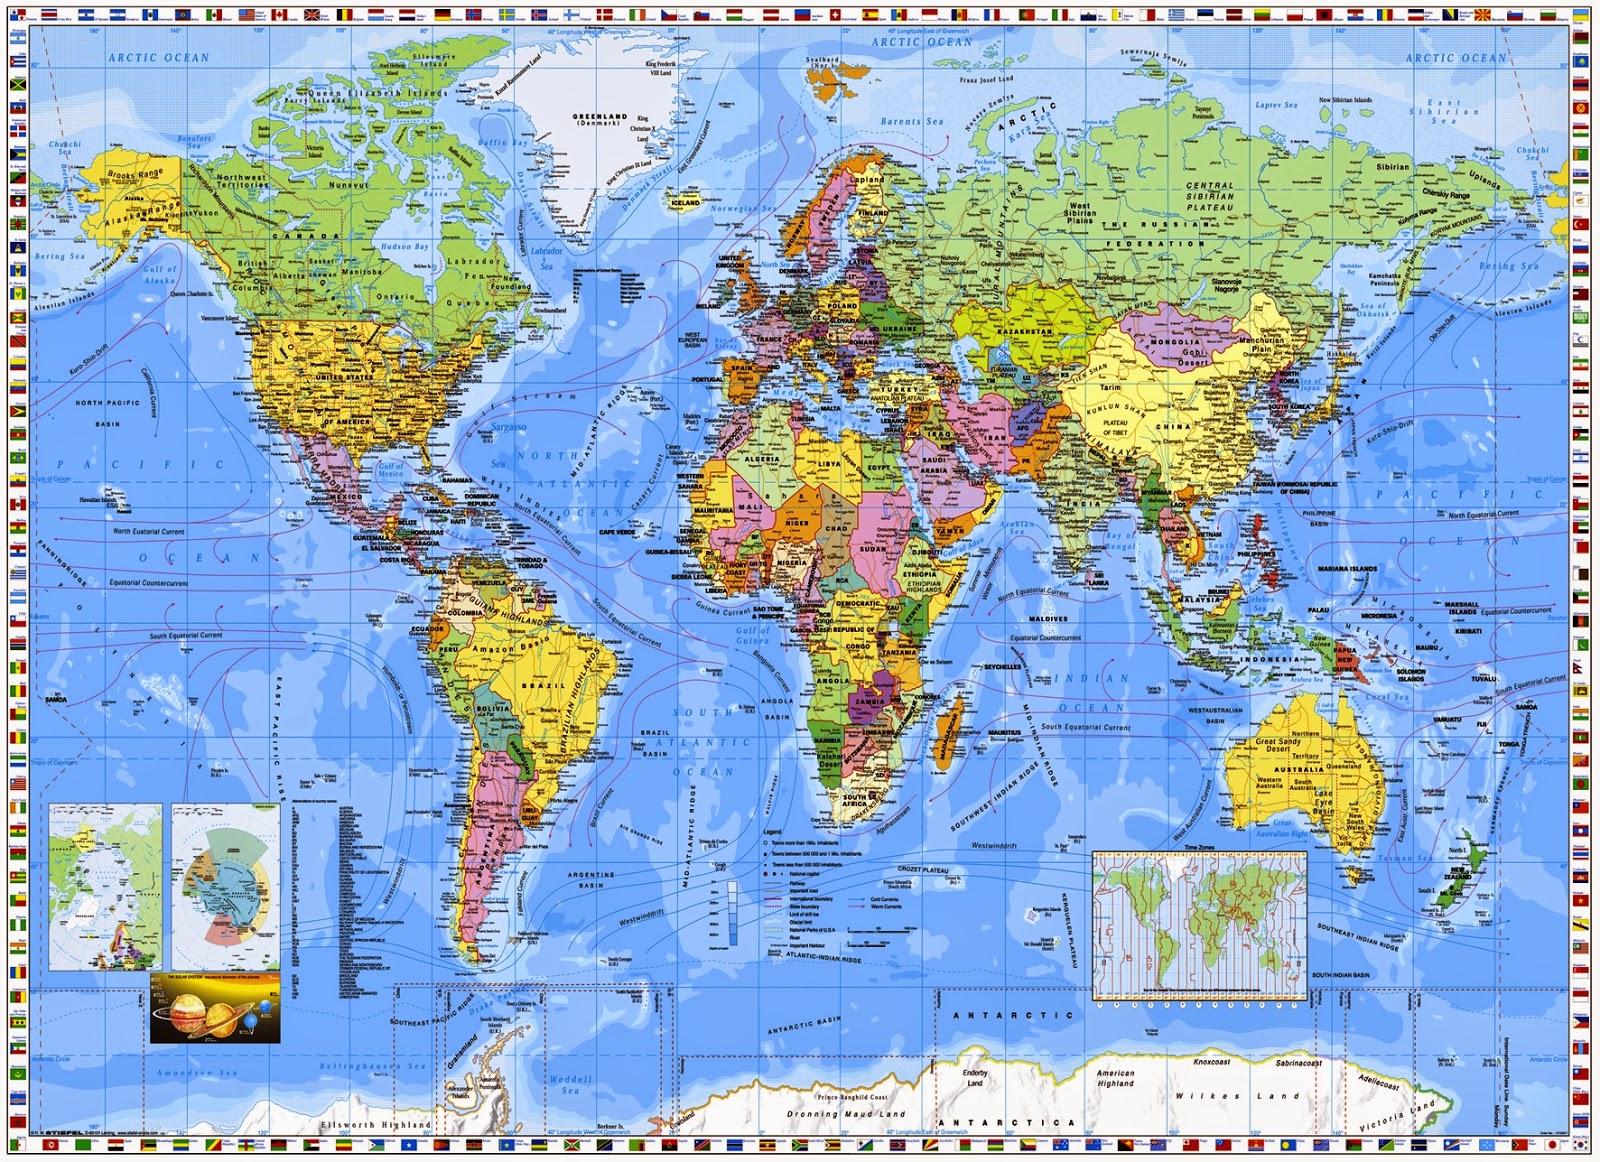 World map desktop wallpaper hd wallpapersafari world map wallpaper for walls world map desktop wallpaper world map 1600x1162 gumiabroncs Image collections